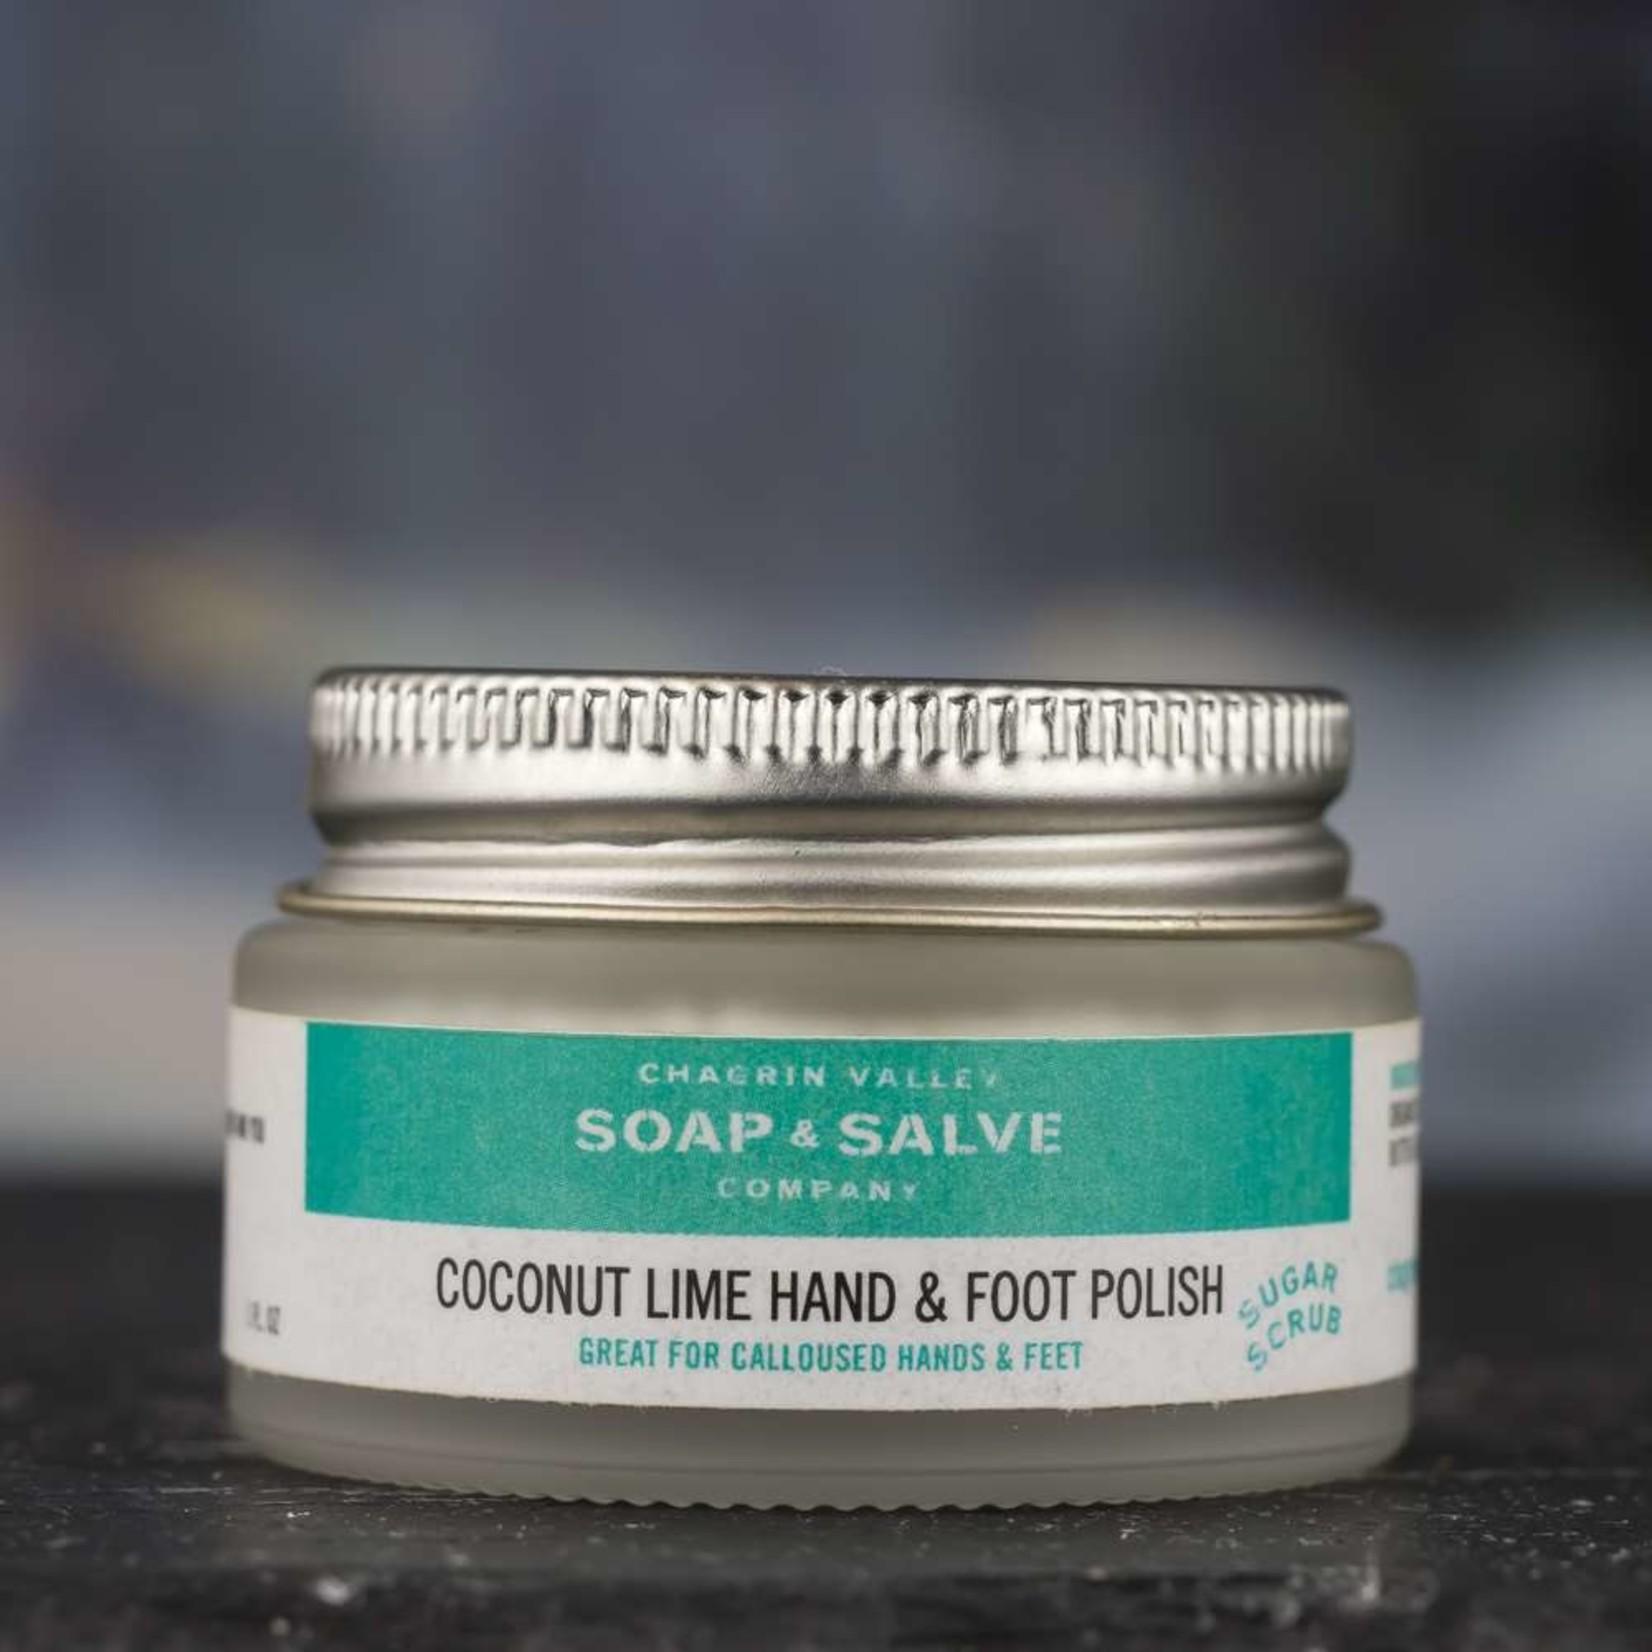 Chagrin Valley Soap and Salve Coconut Lime Hand & Foot Sugar Scrub 1oz jar